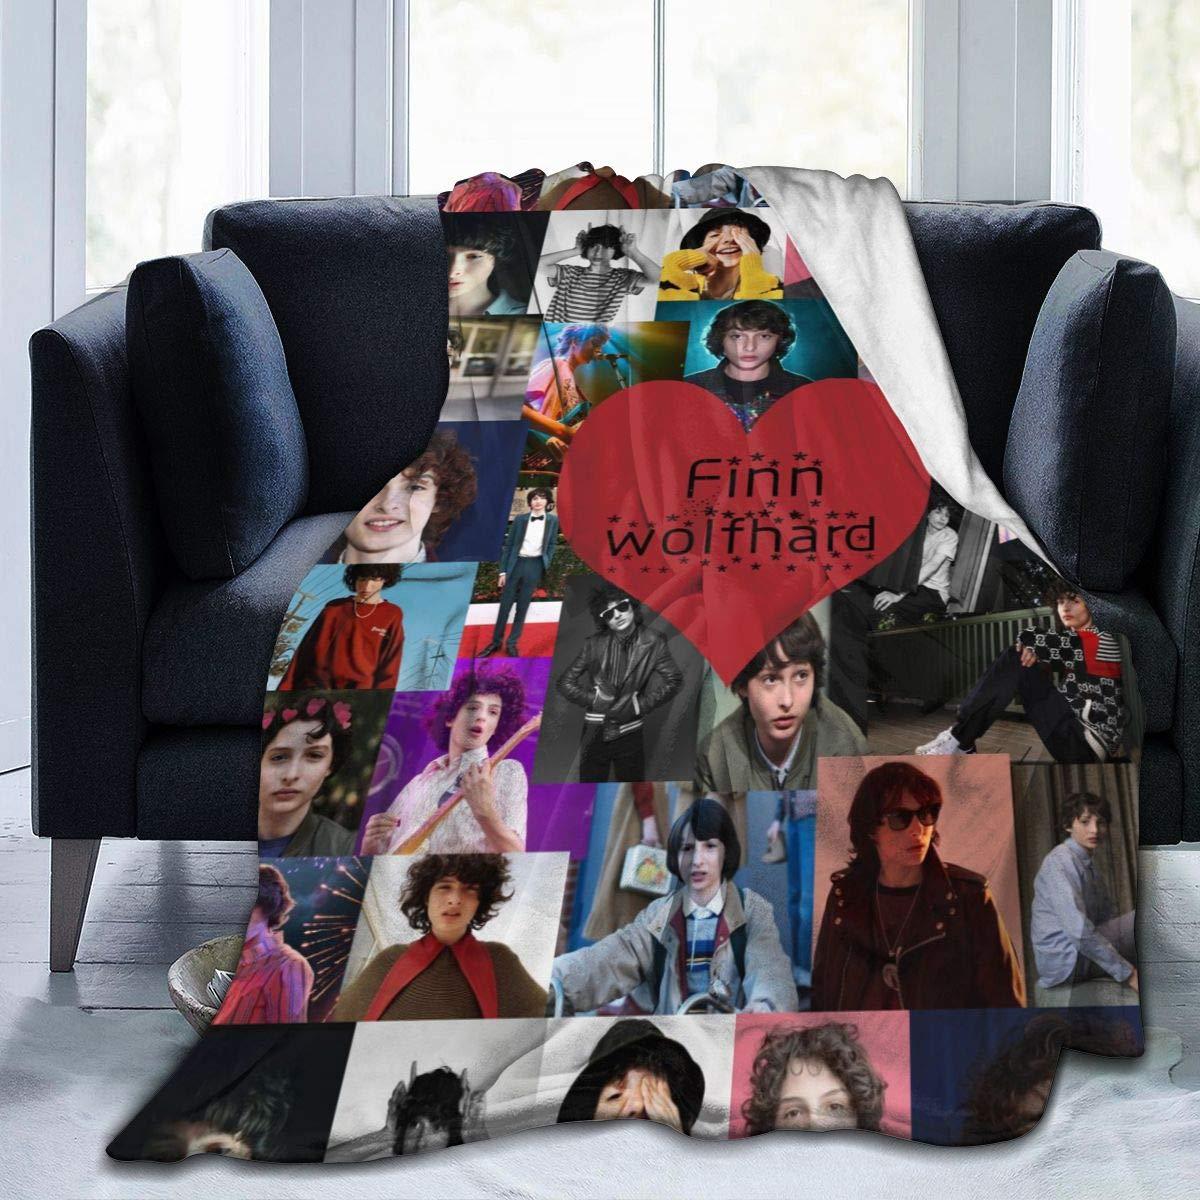 ZAZAHUI Finn Wolfhard Blanket Love Collage Ultra-Soft Micro Fleece Blanket